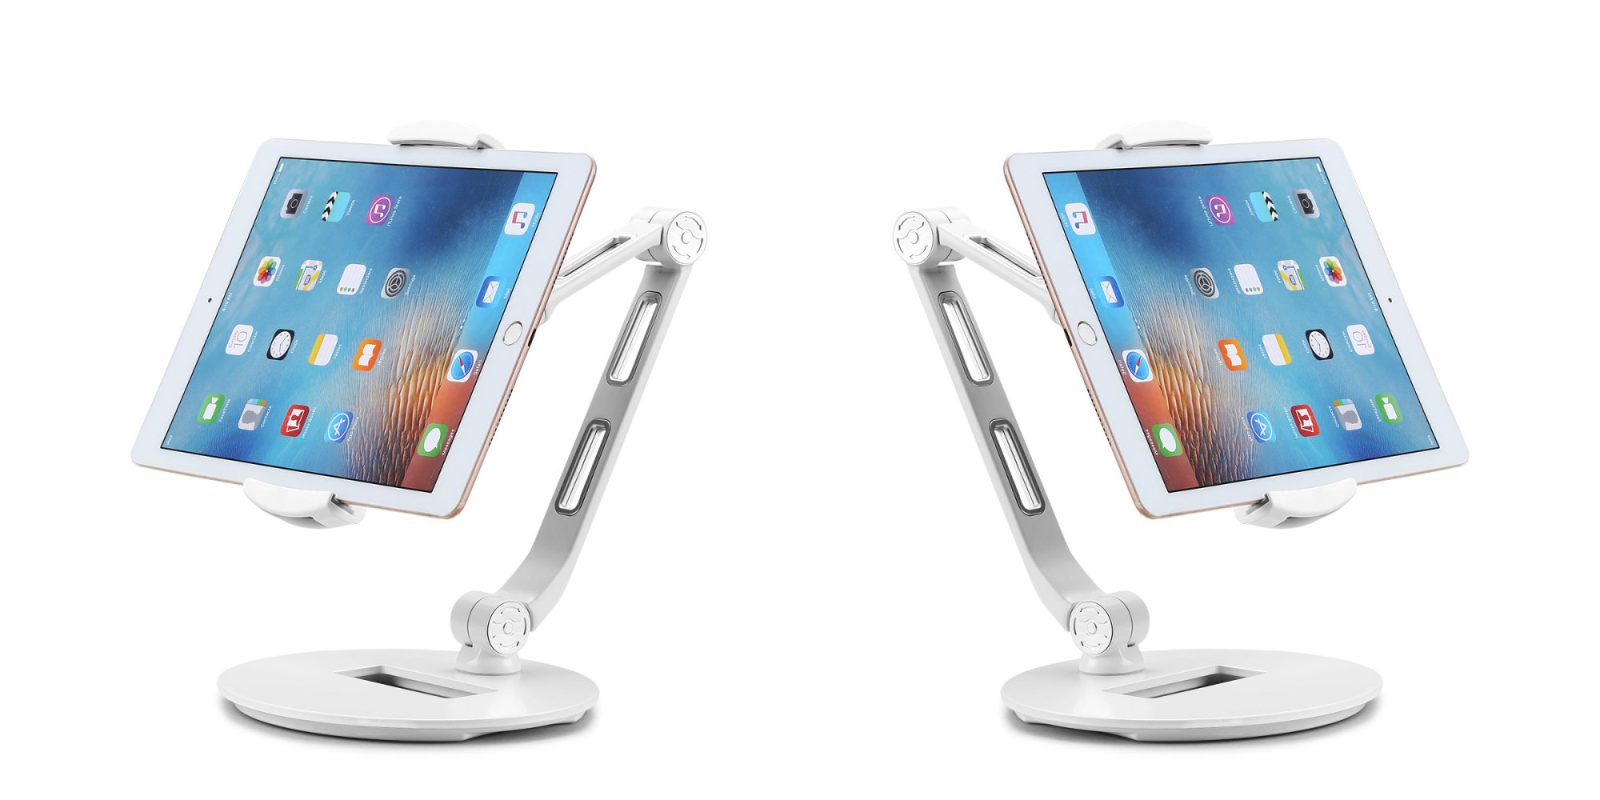 Prep for MacOS Catalina & Sidecar w/ this $21 iPad desk mount (Reg. $30+)